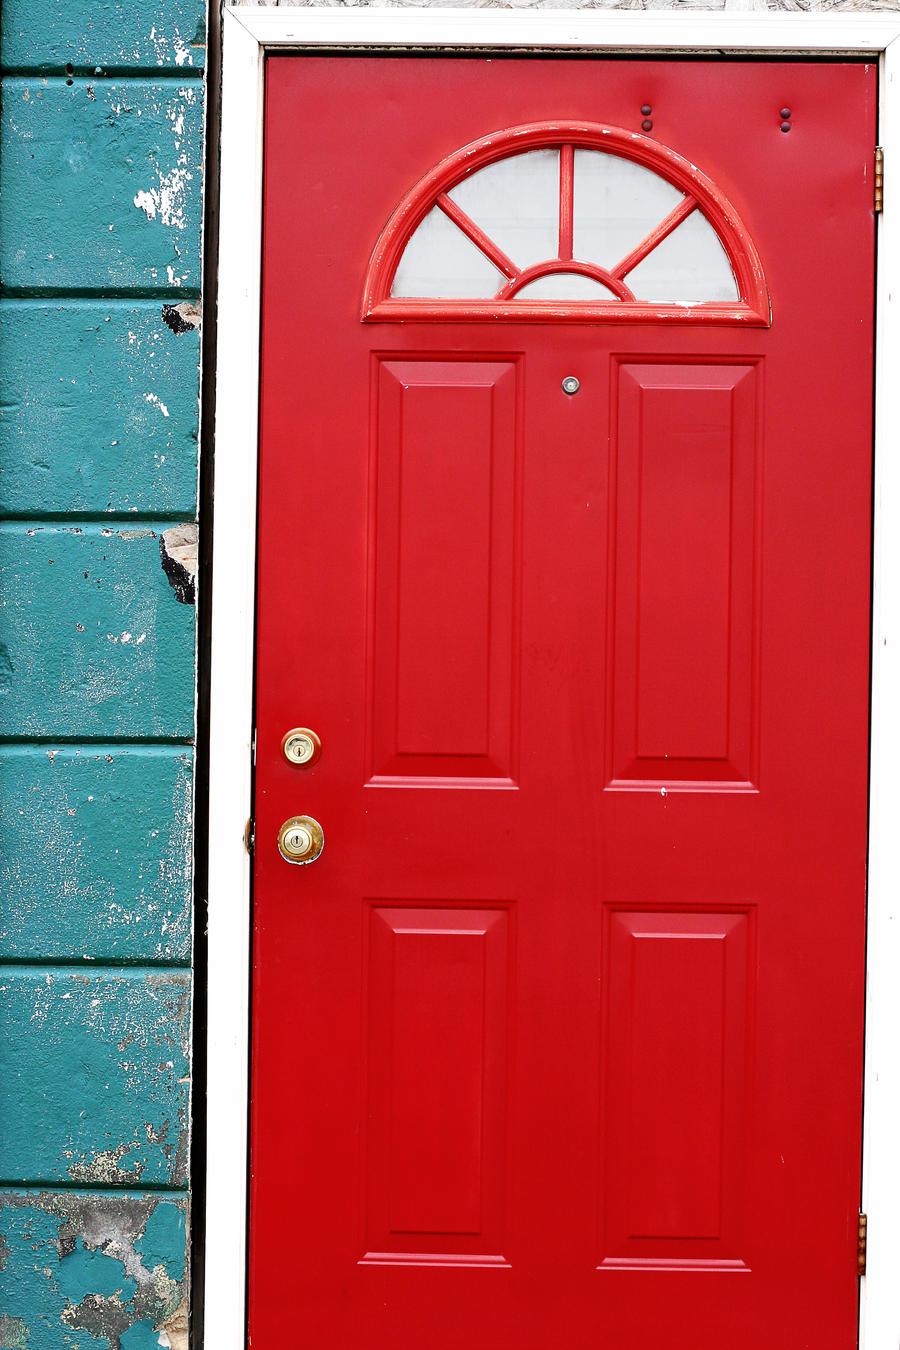 Painting An Exterior Door Red